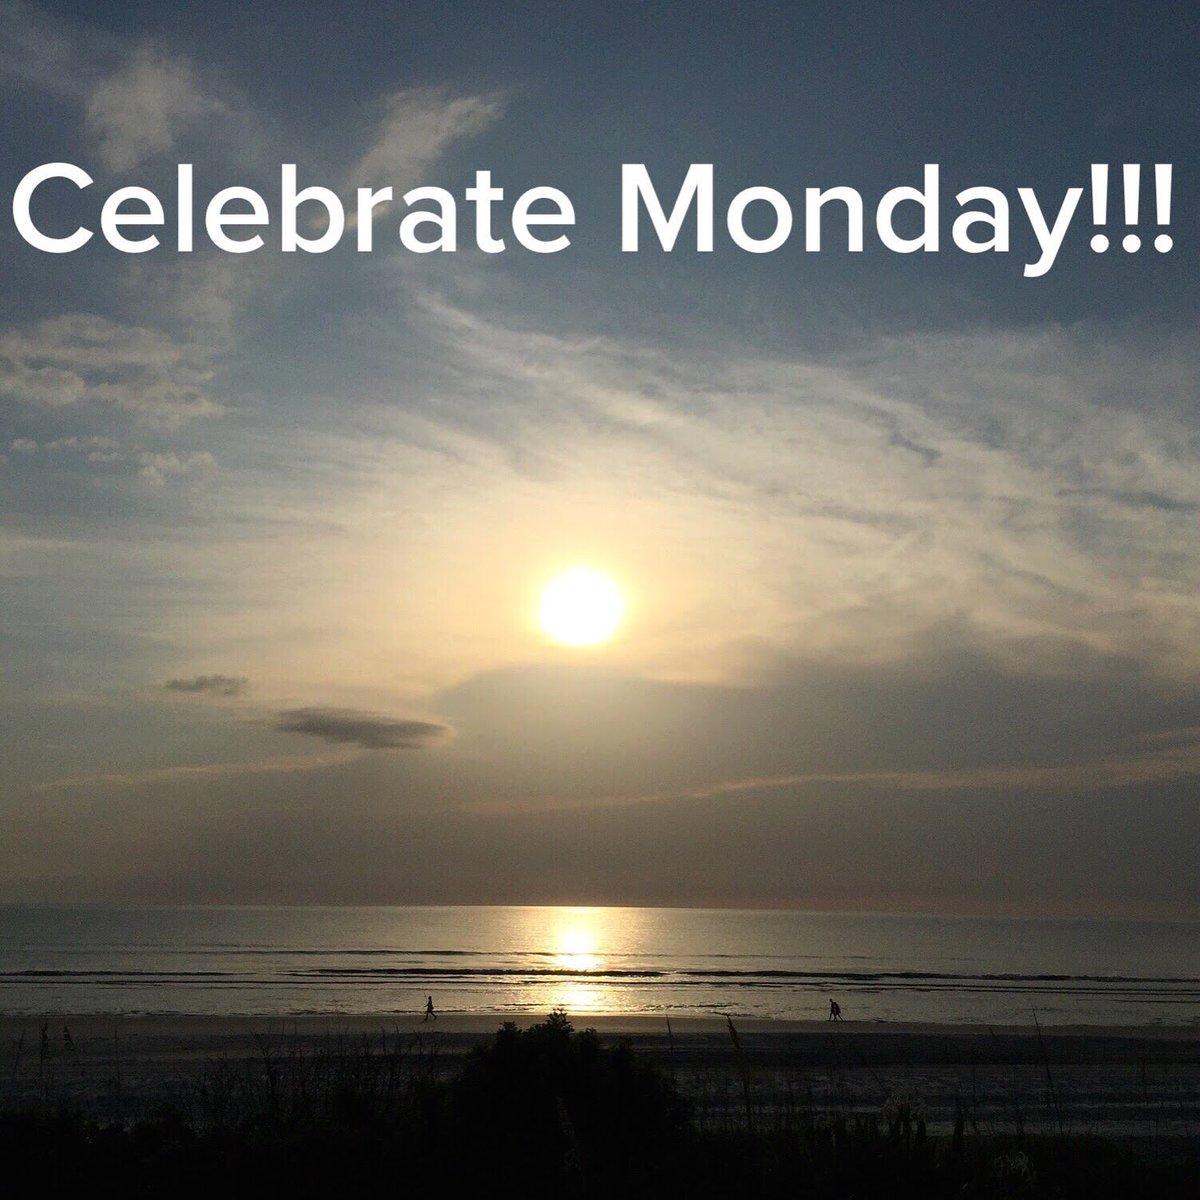 Happy Monday all. Go and be Amazing!! #CelebrateMonday  #bfc530 <br>http://pic.twitter.com/AlOV9LdPy8